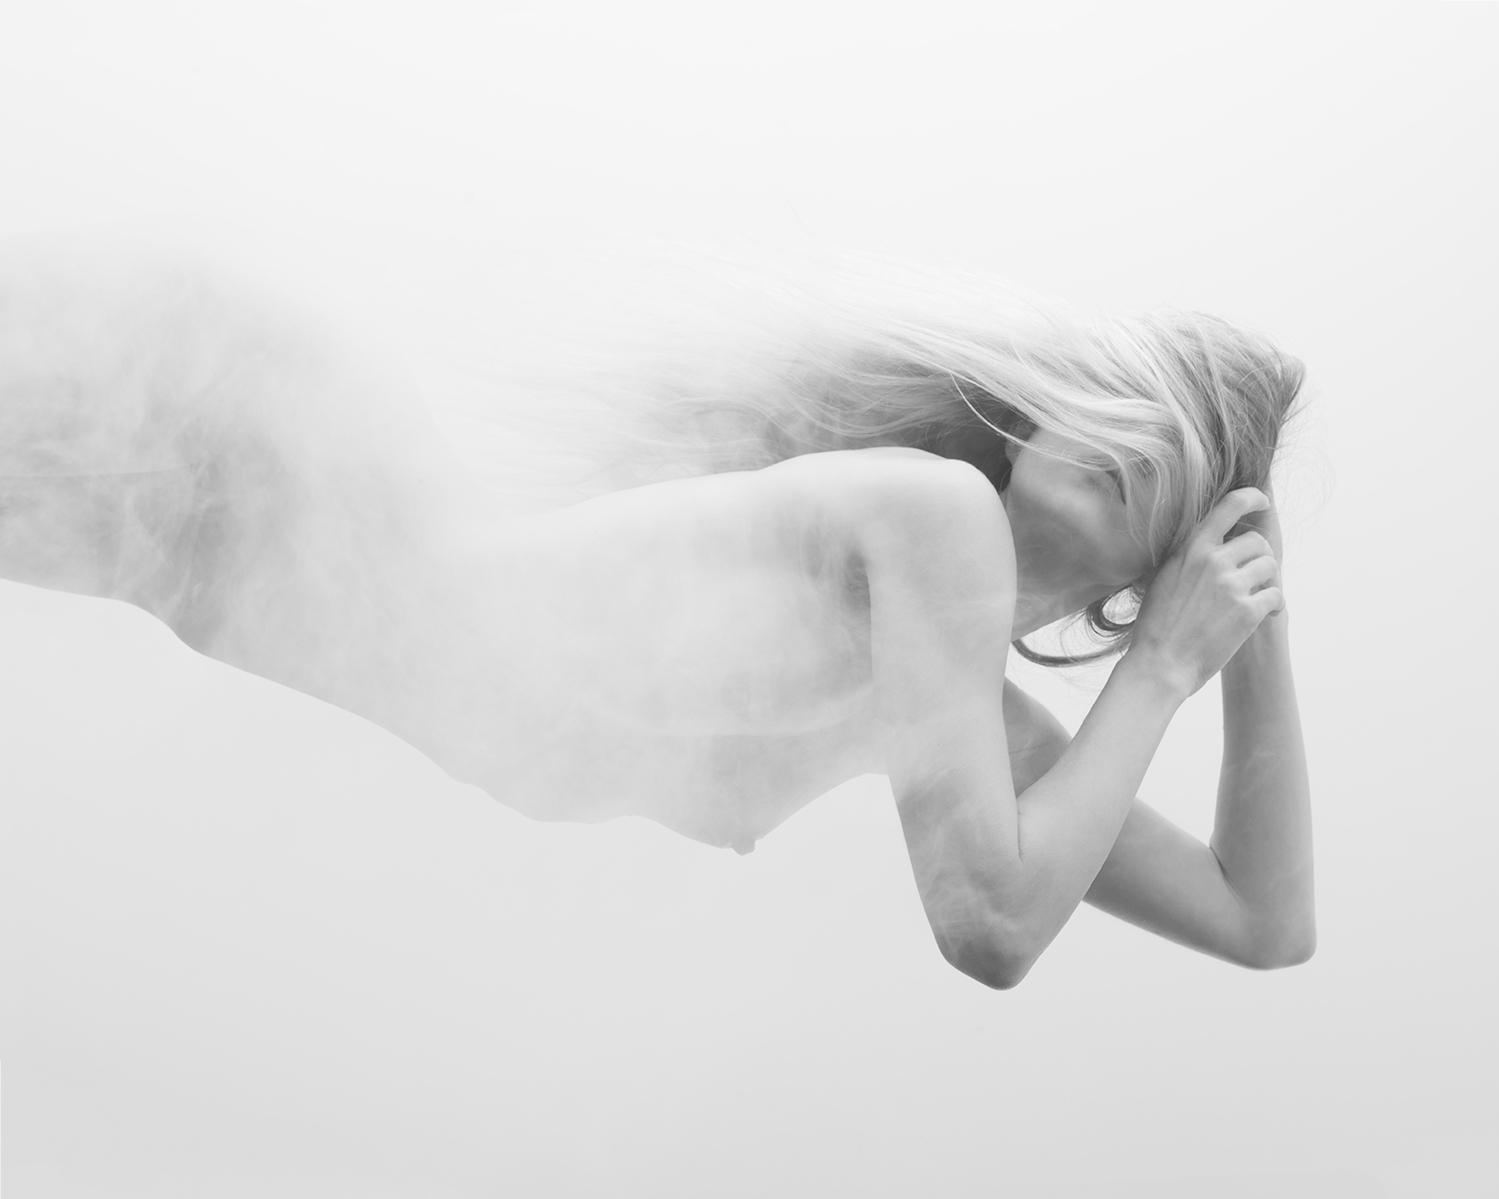 Rouse, Dream Awake series. Inco - impureacts | ello